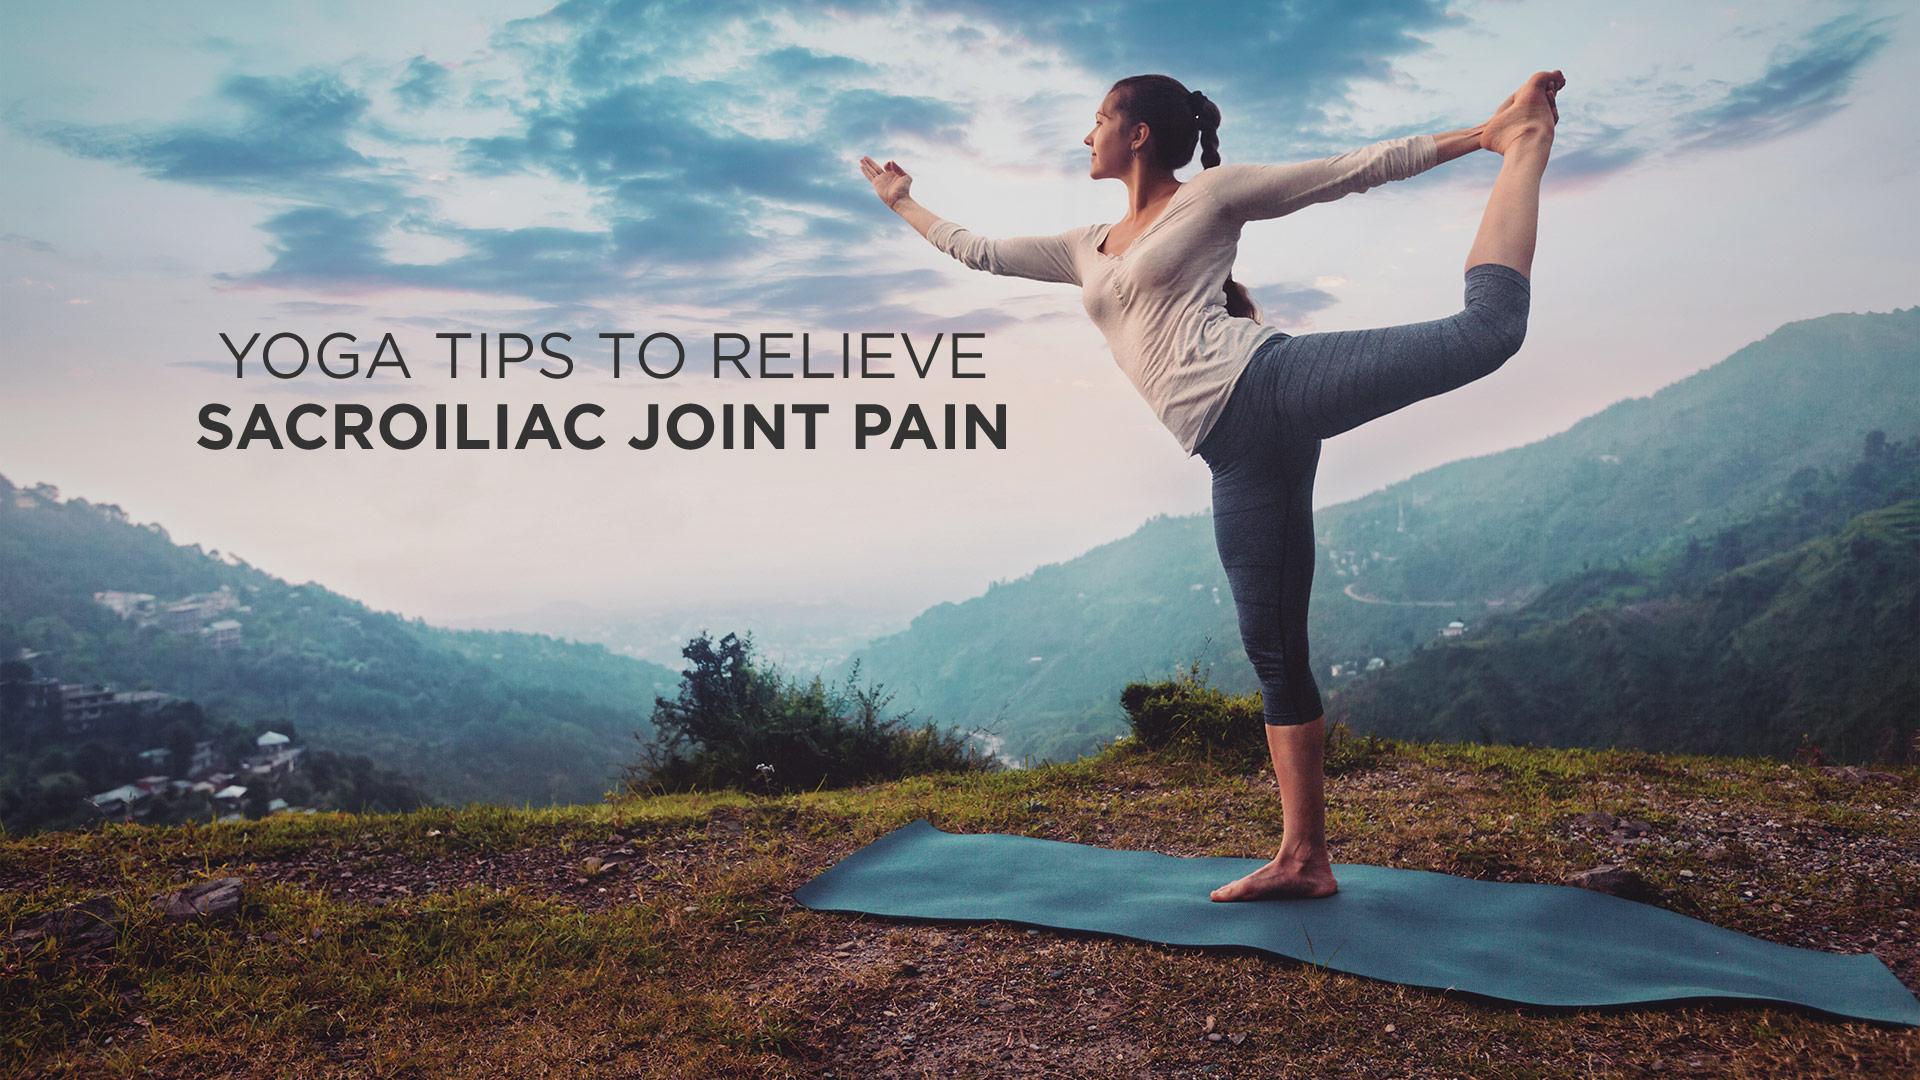 Viniyoga Yoga DVD Teaches Yoga Practice For Healing